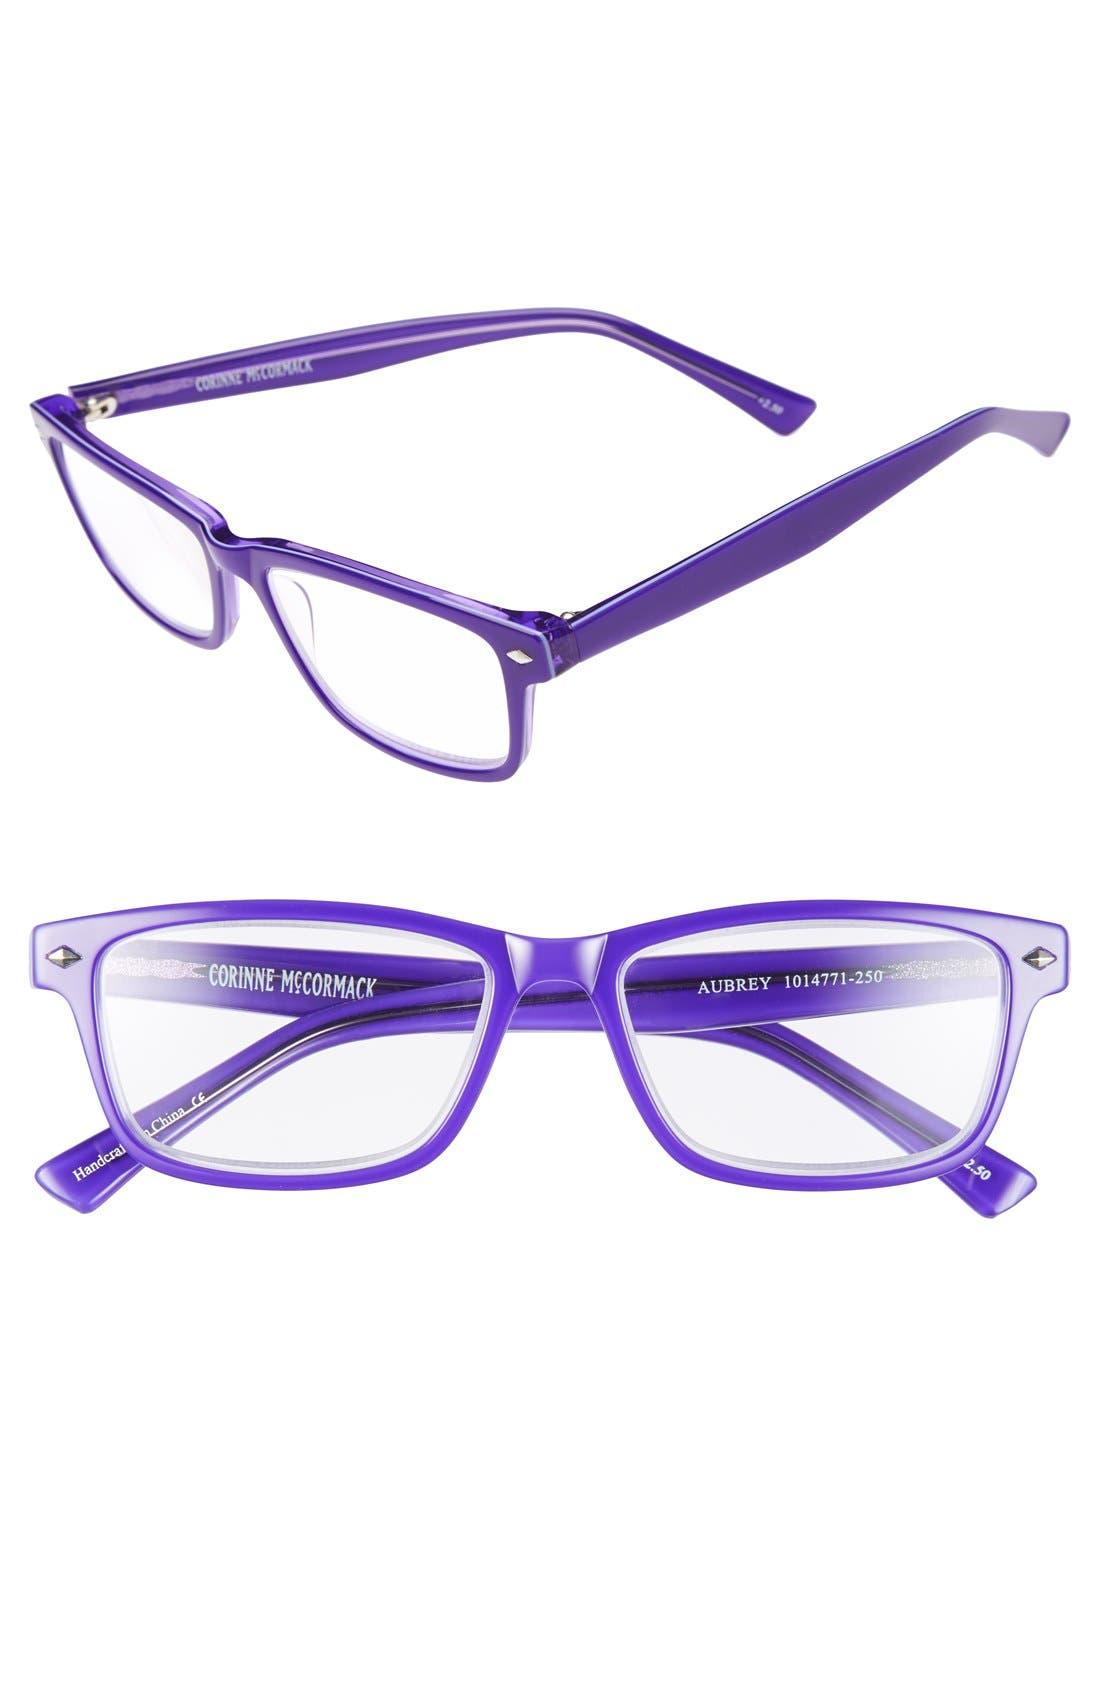 Alternate Image 1 Selected - Corinne McCormack 'Aubrey' 52mm Reading Glasses